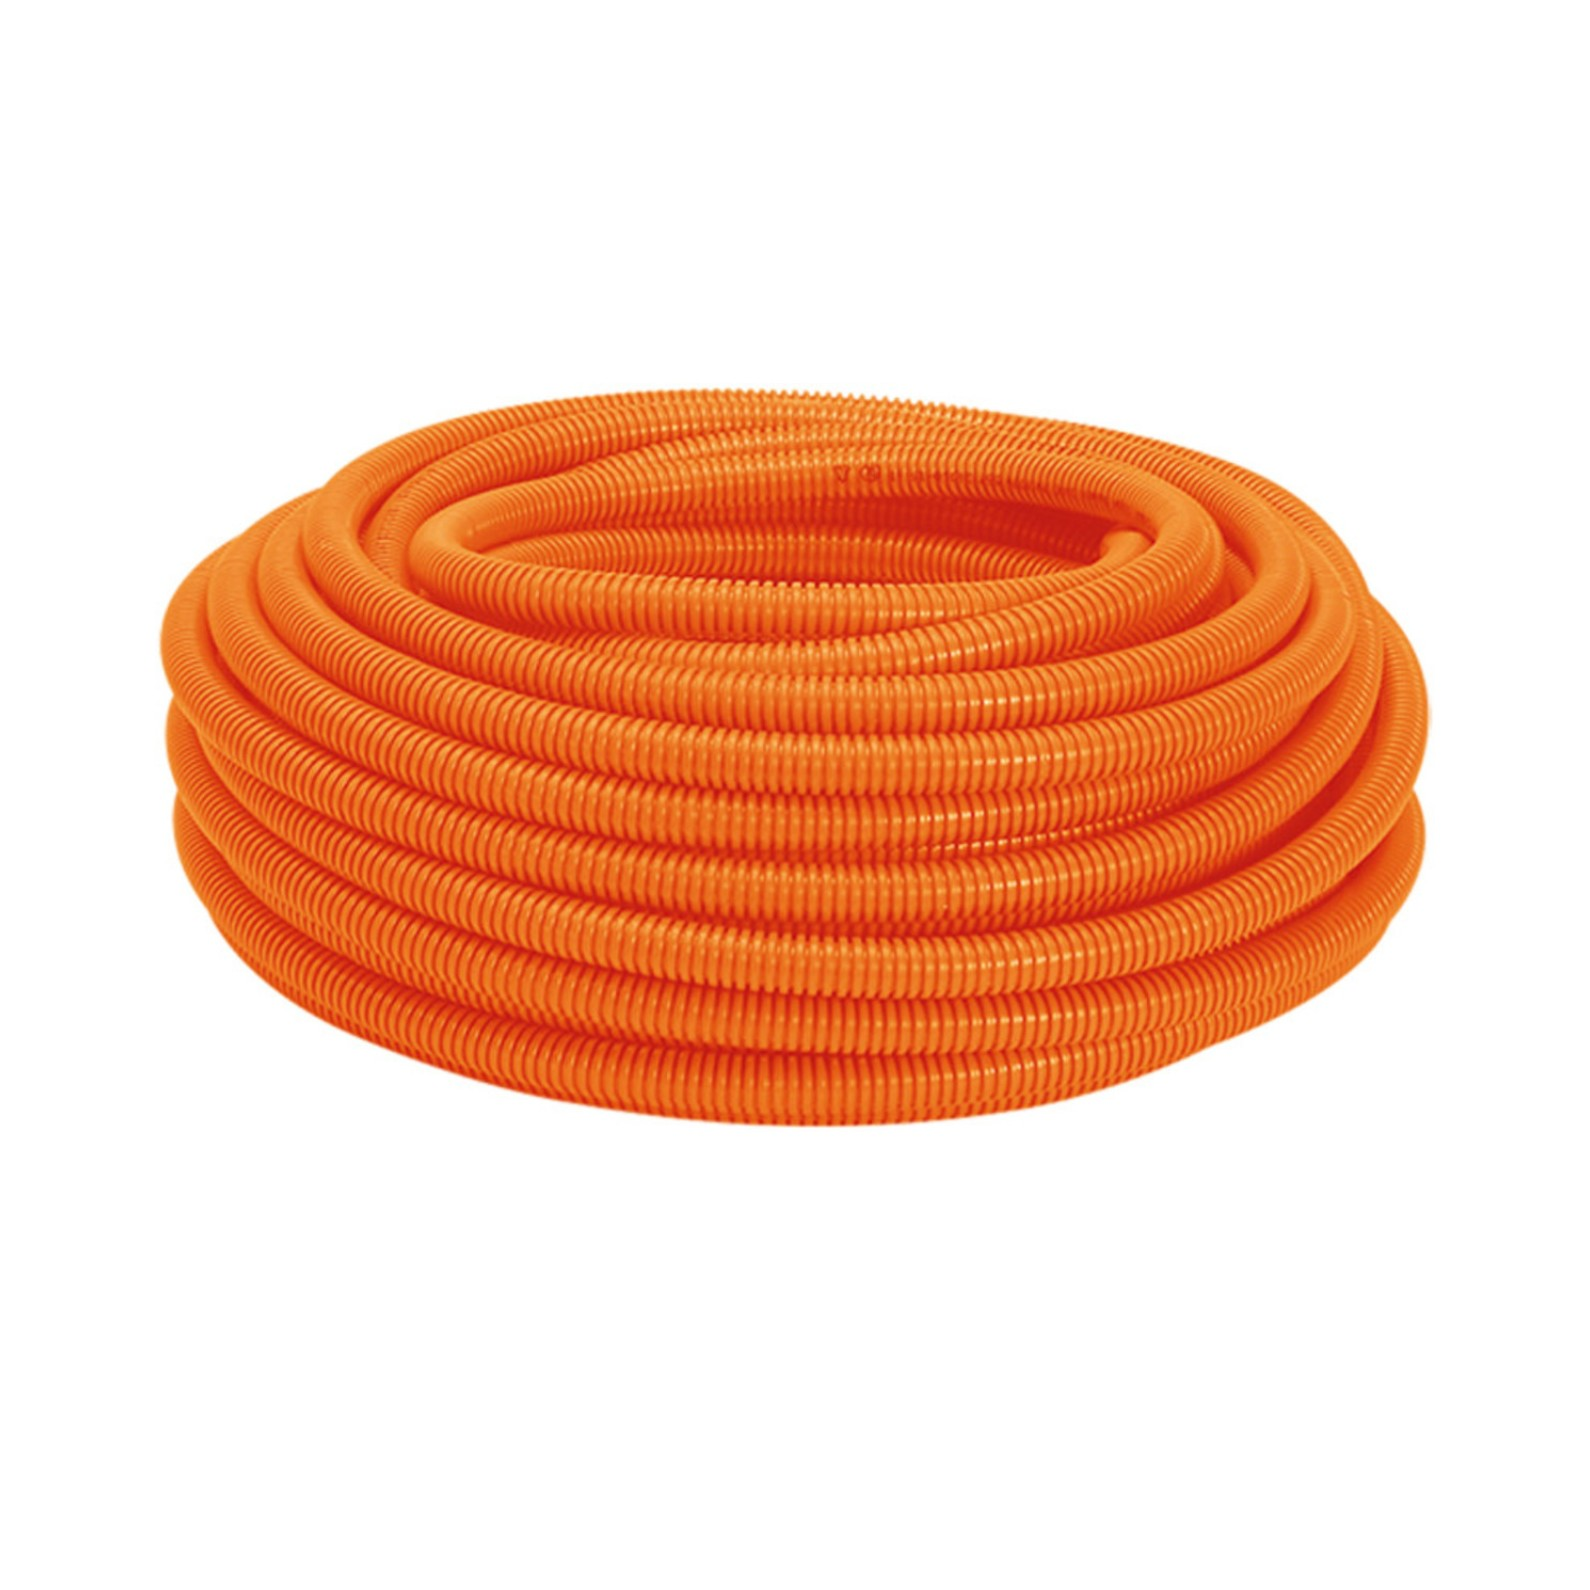 Eletroduto Flexivel Corrugado PVC DN 20 mm x 50m Laranja - Amanco